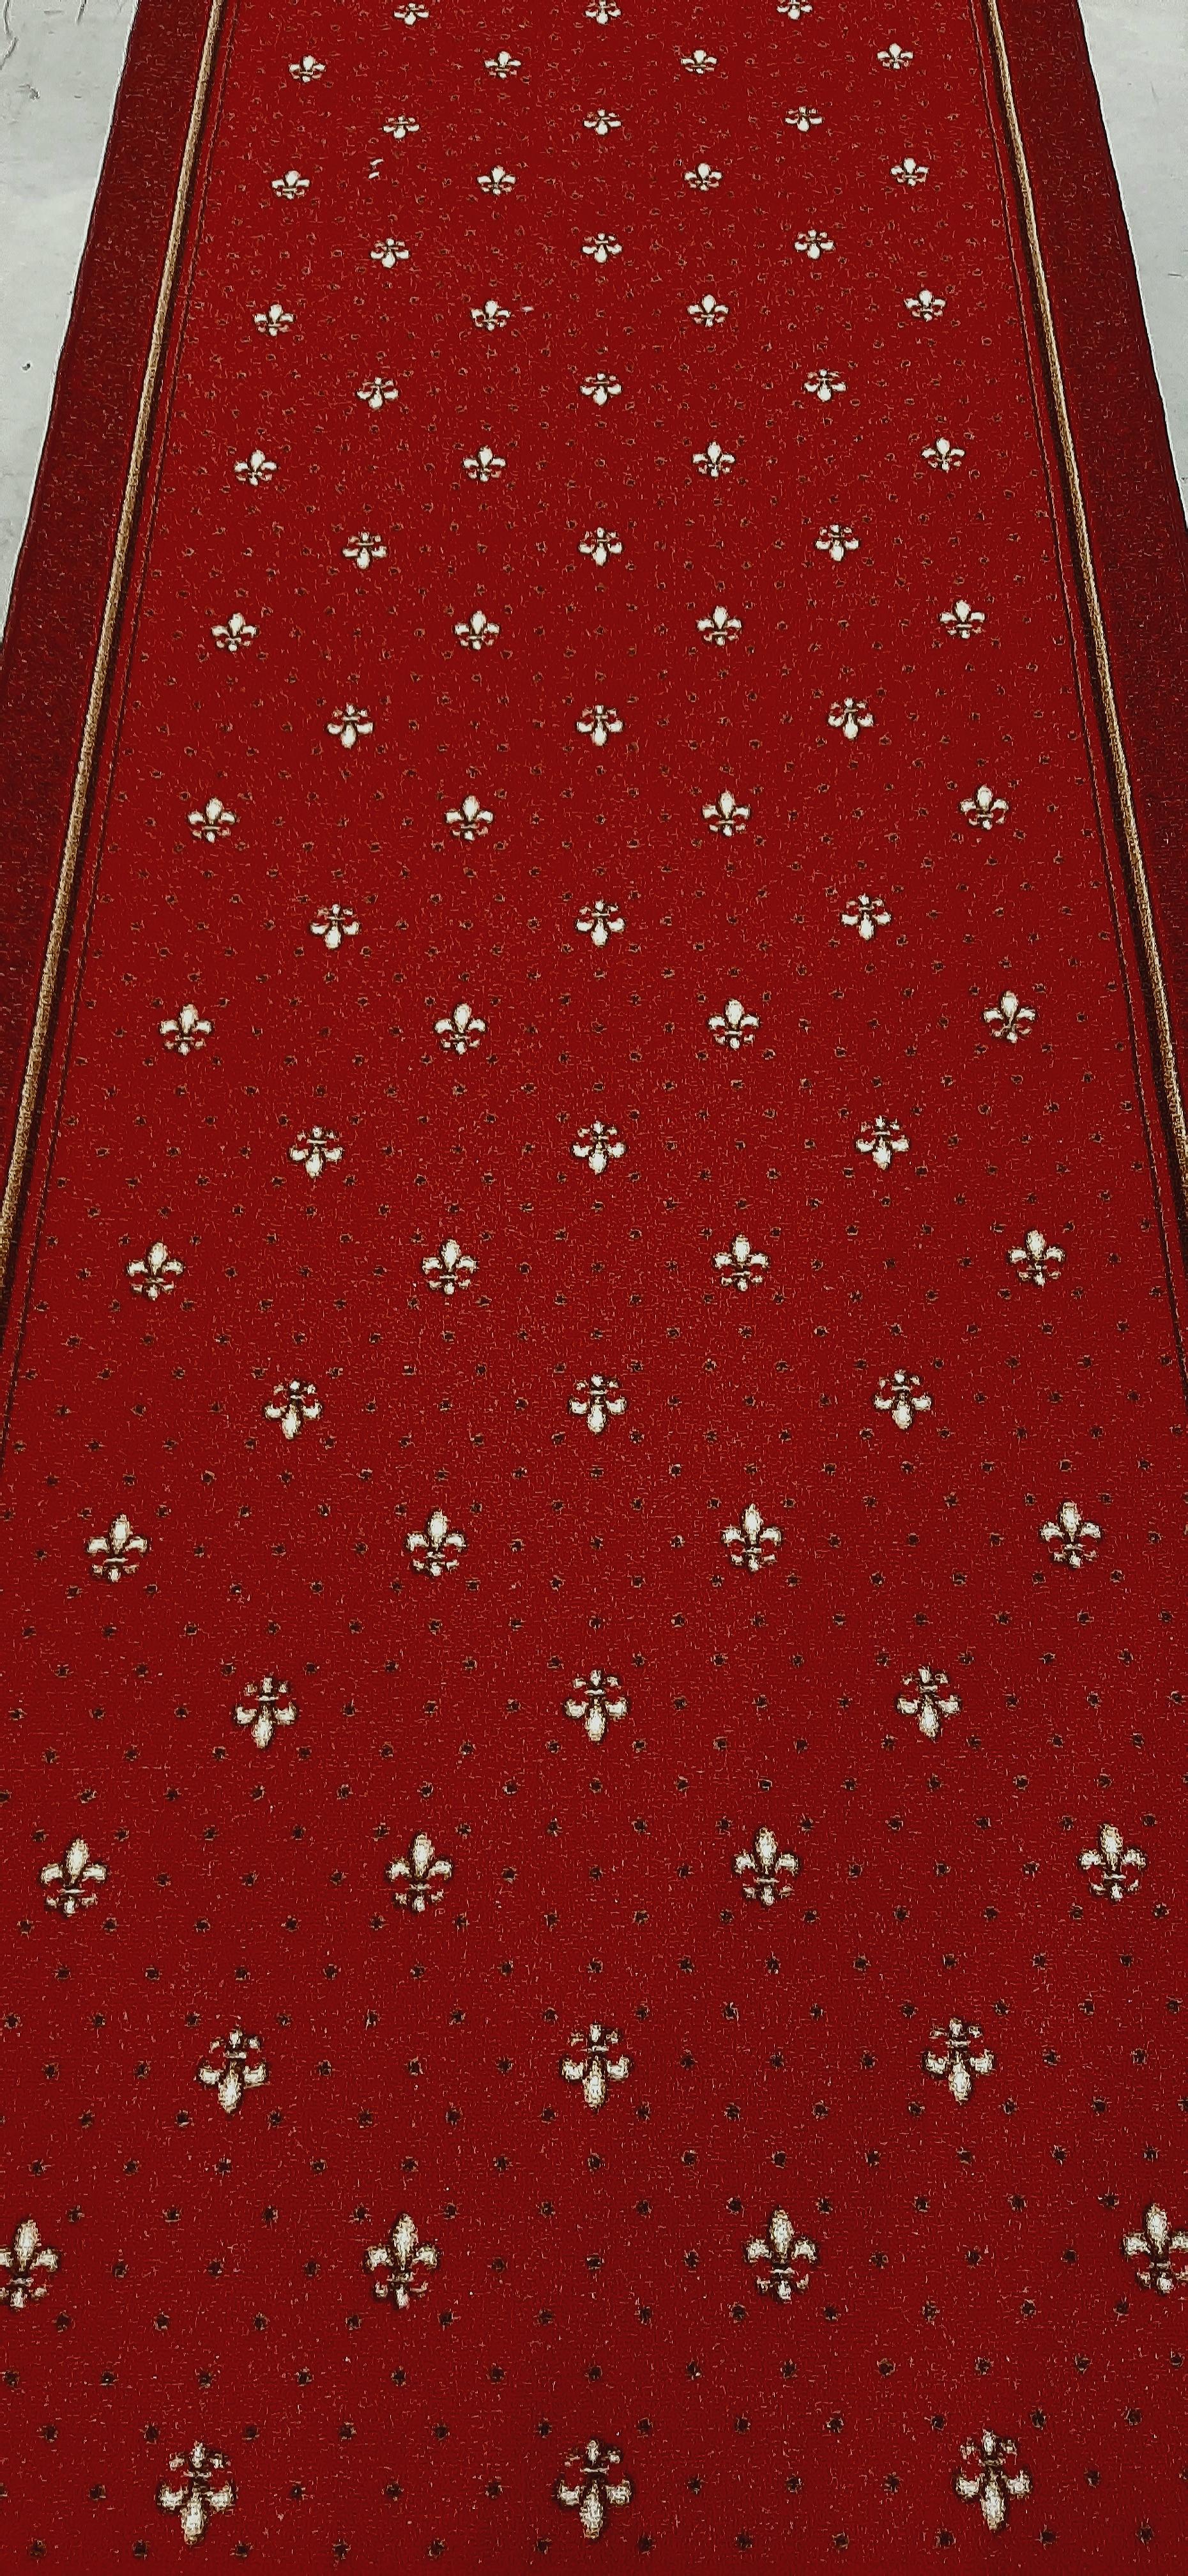 Traversa Tesatura Plata 1835, Rosu, 100x2500 cm, 820 gr/mp 1